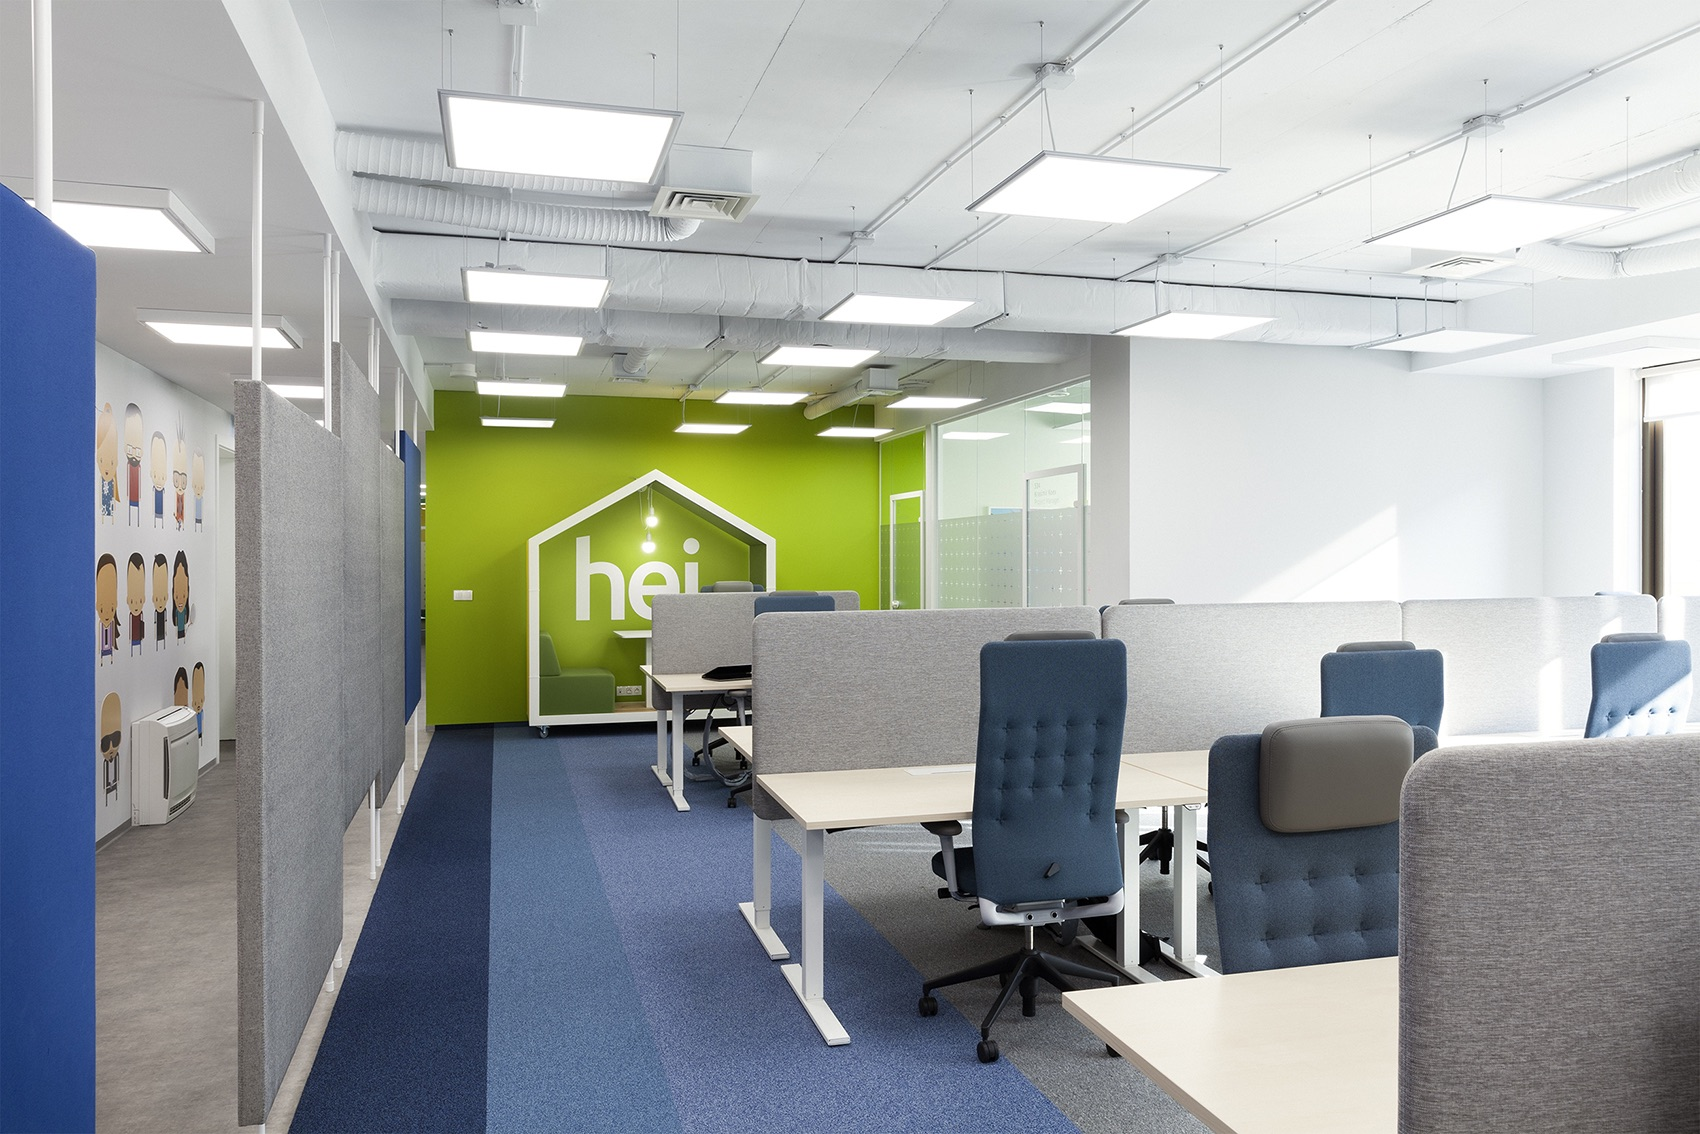 A look inside accedia s modern new sofia office officelovin 39 - Interior design office space ...